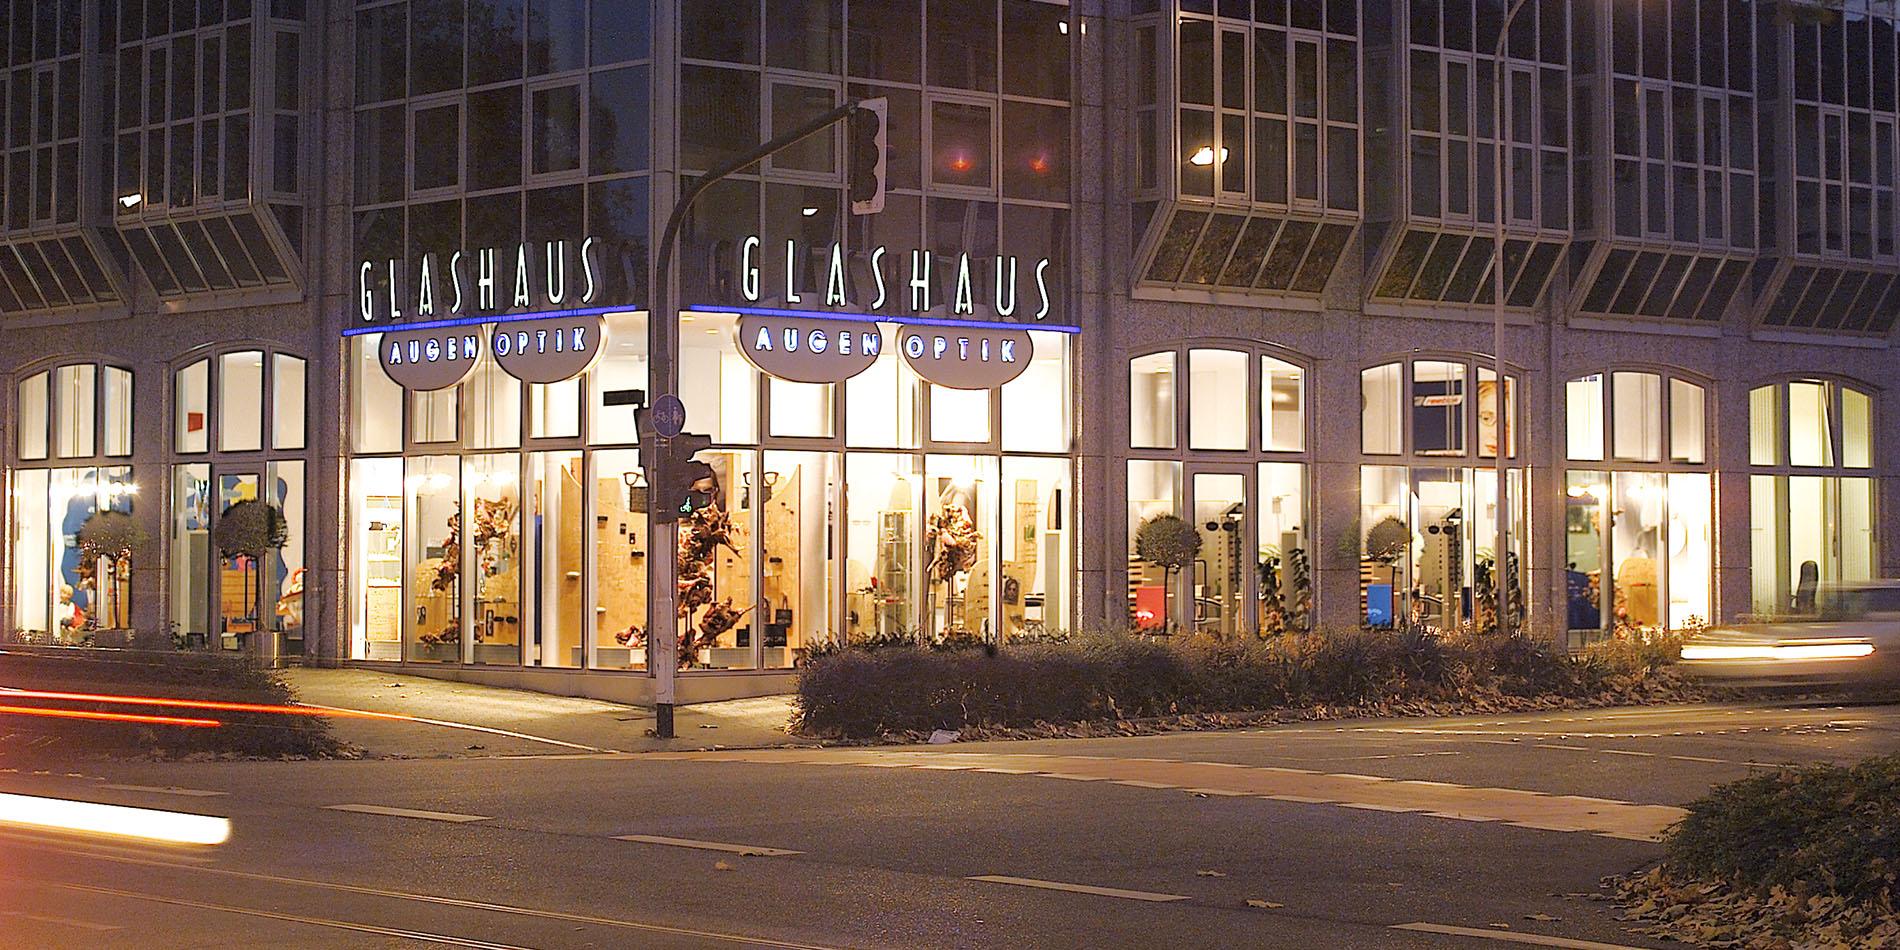 Fotodesign-matthias-schütz-glashaus